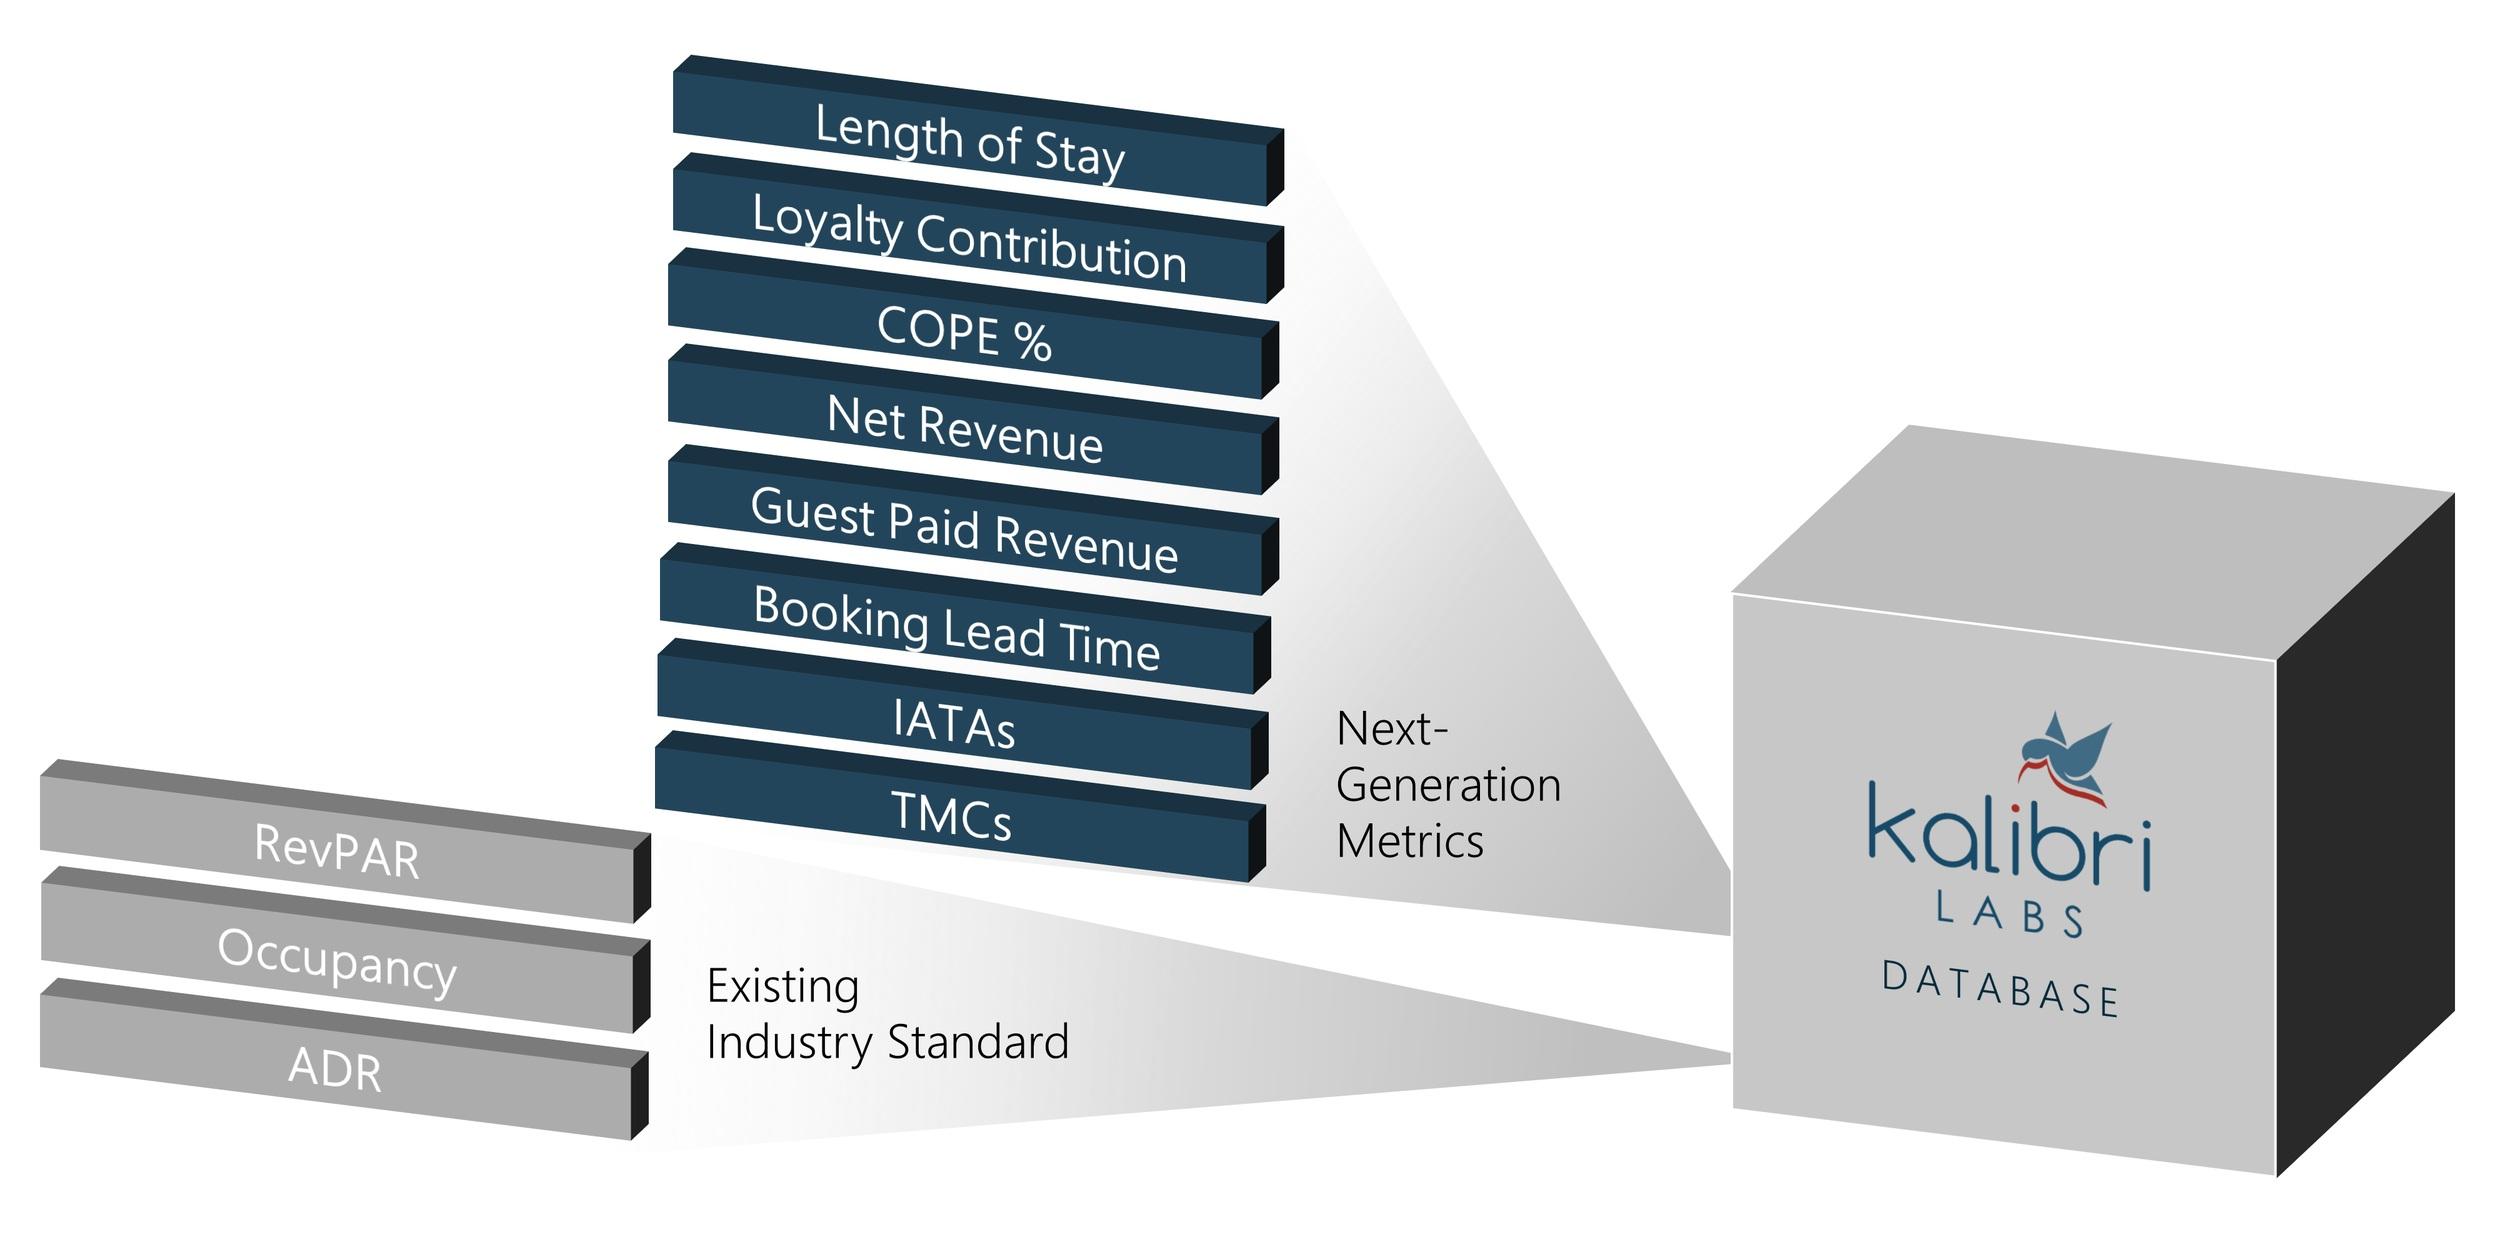 Next-Generation+Hotel+Metrics.jpg